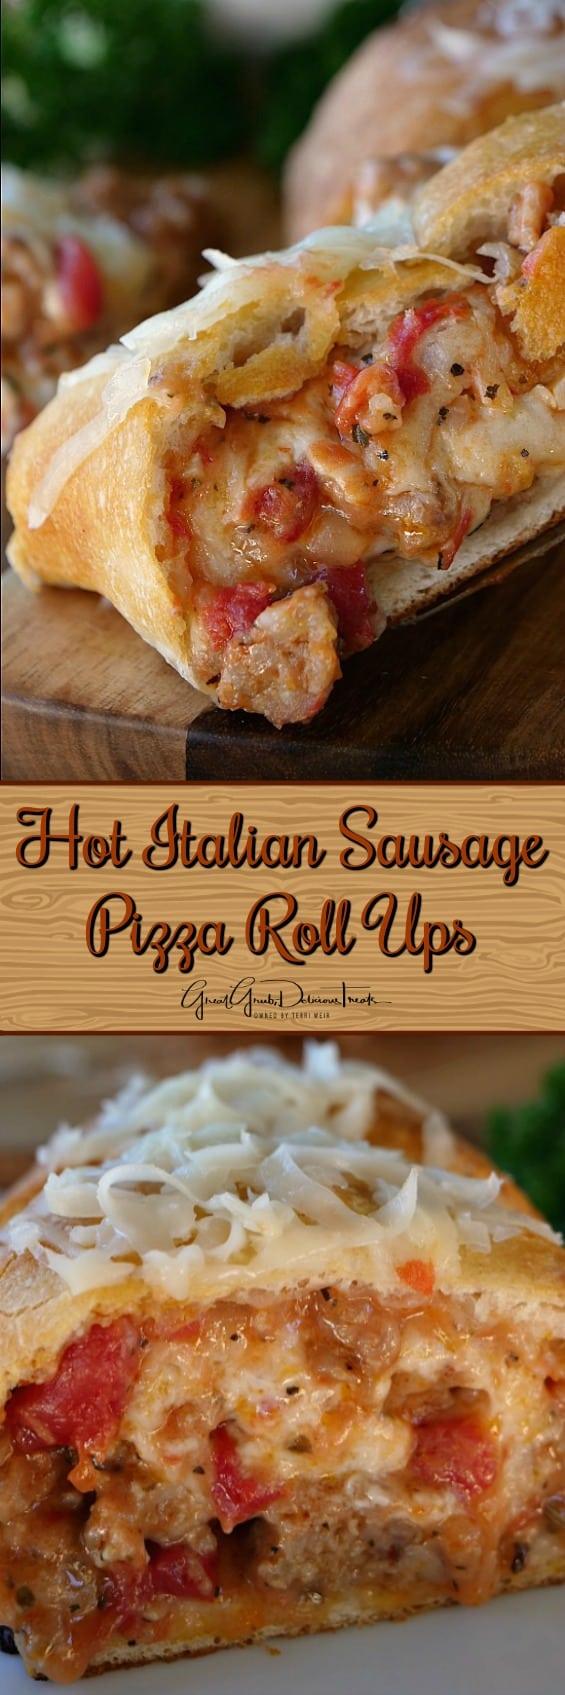 Hot Italian Sausage Pizza Roll Ups